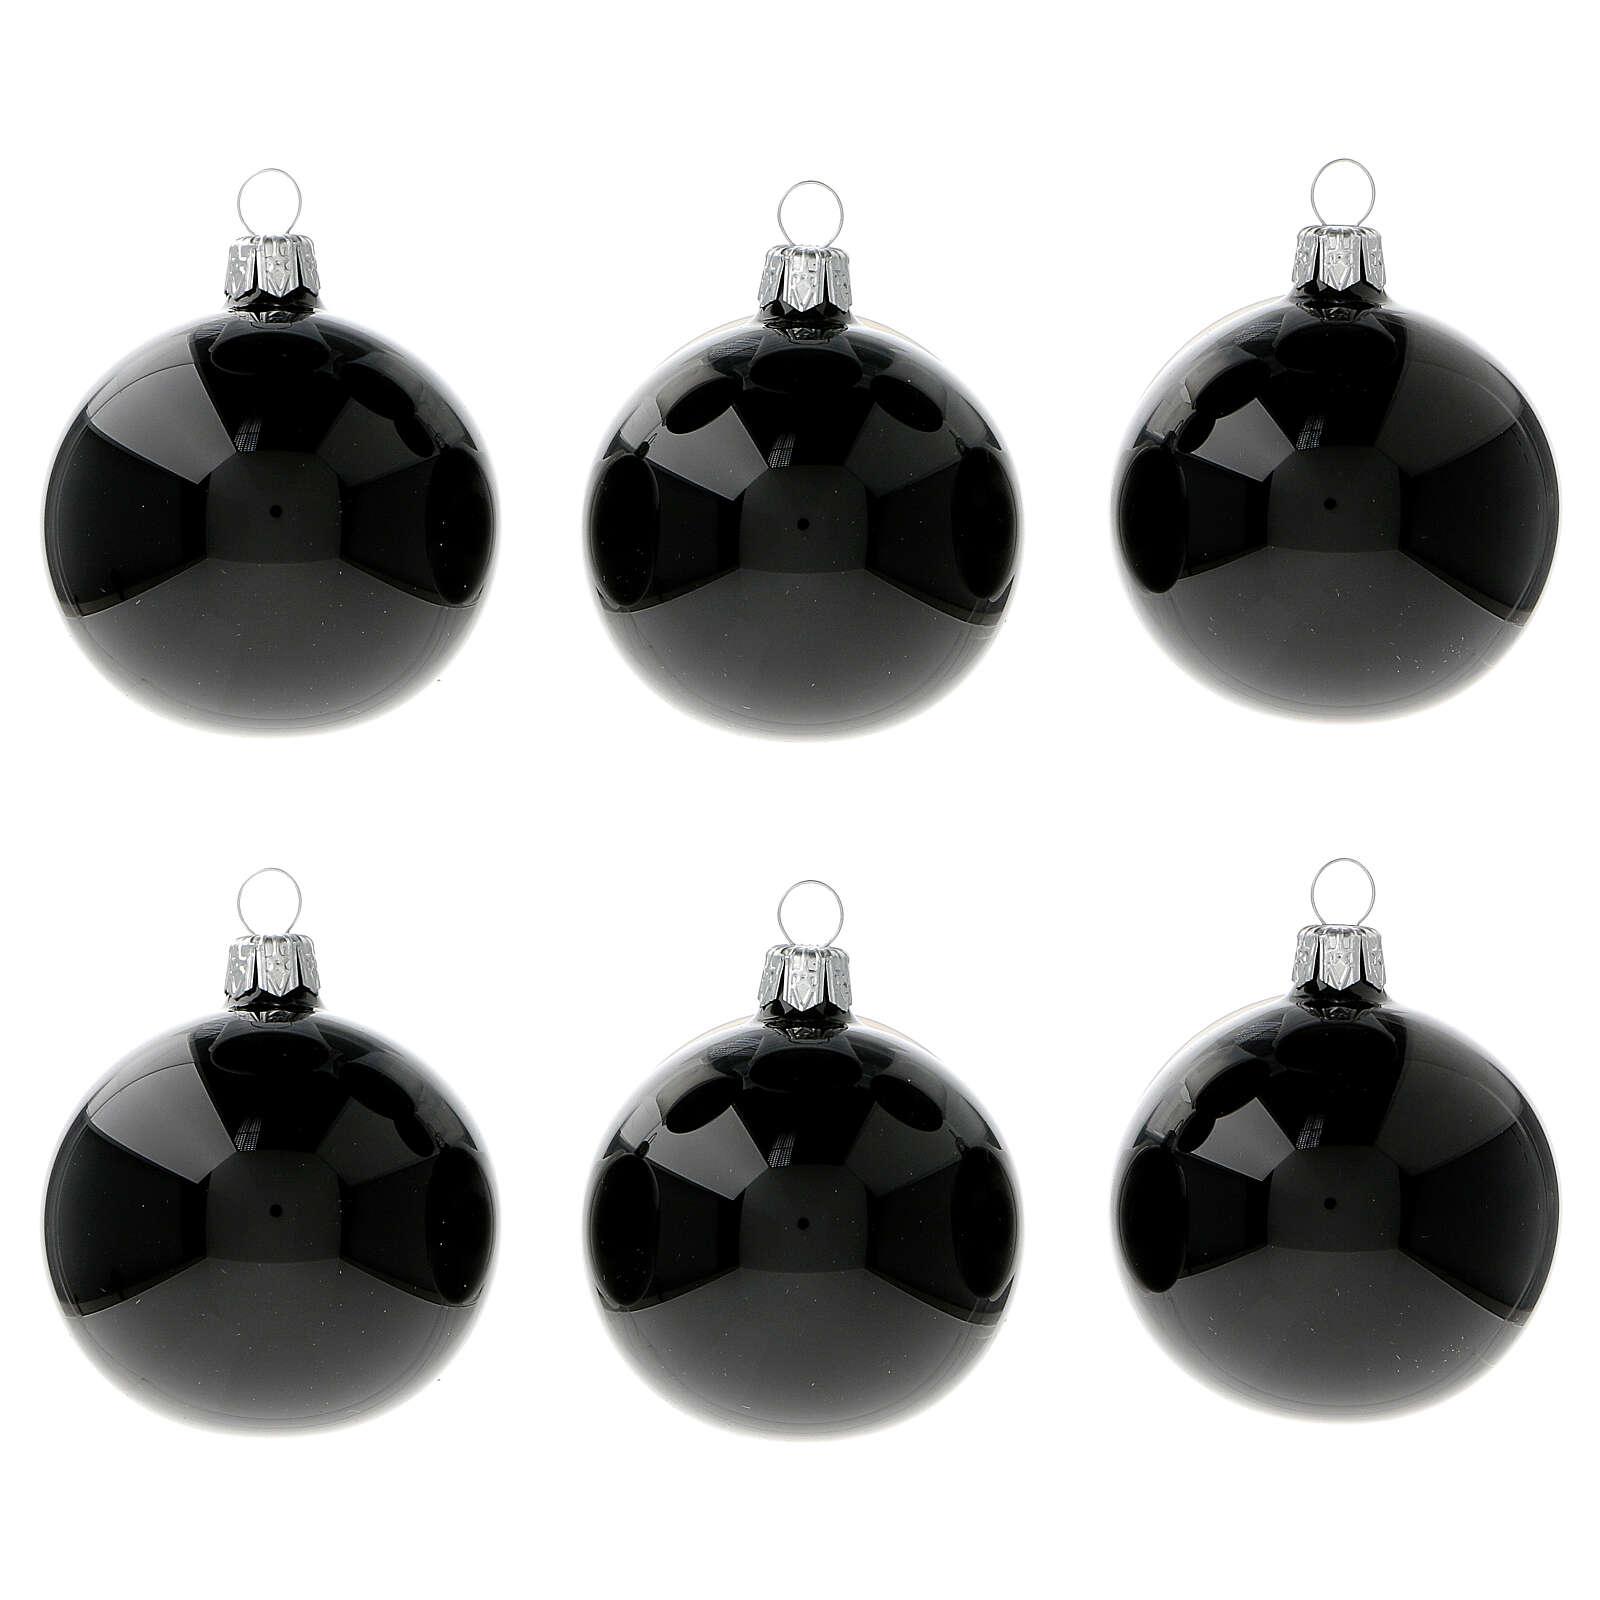 Black shiny blown glass Christmas balls 6 cm 6 pcs 4